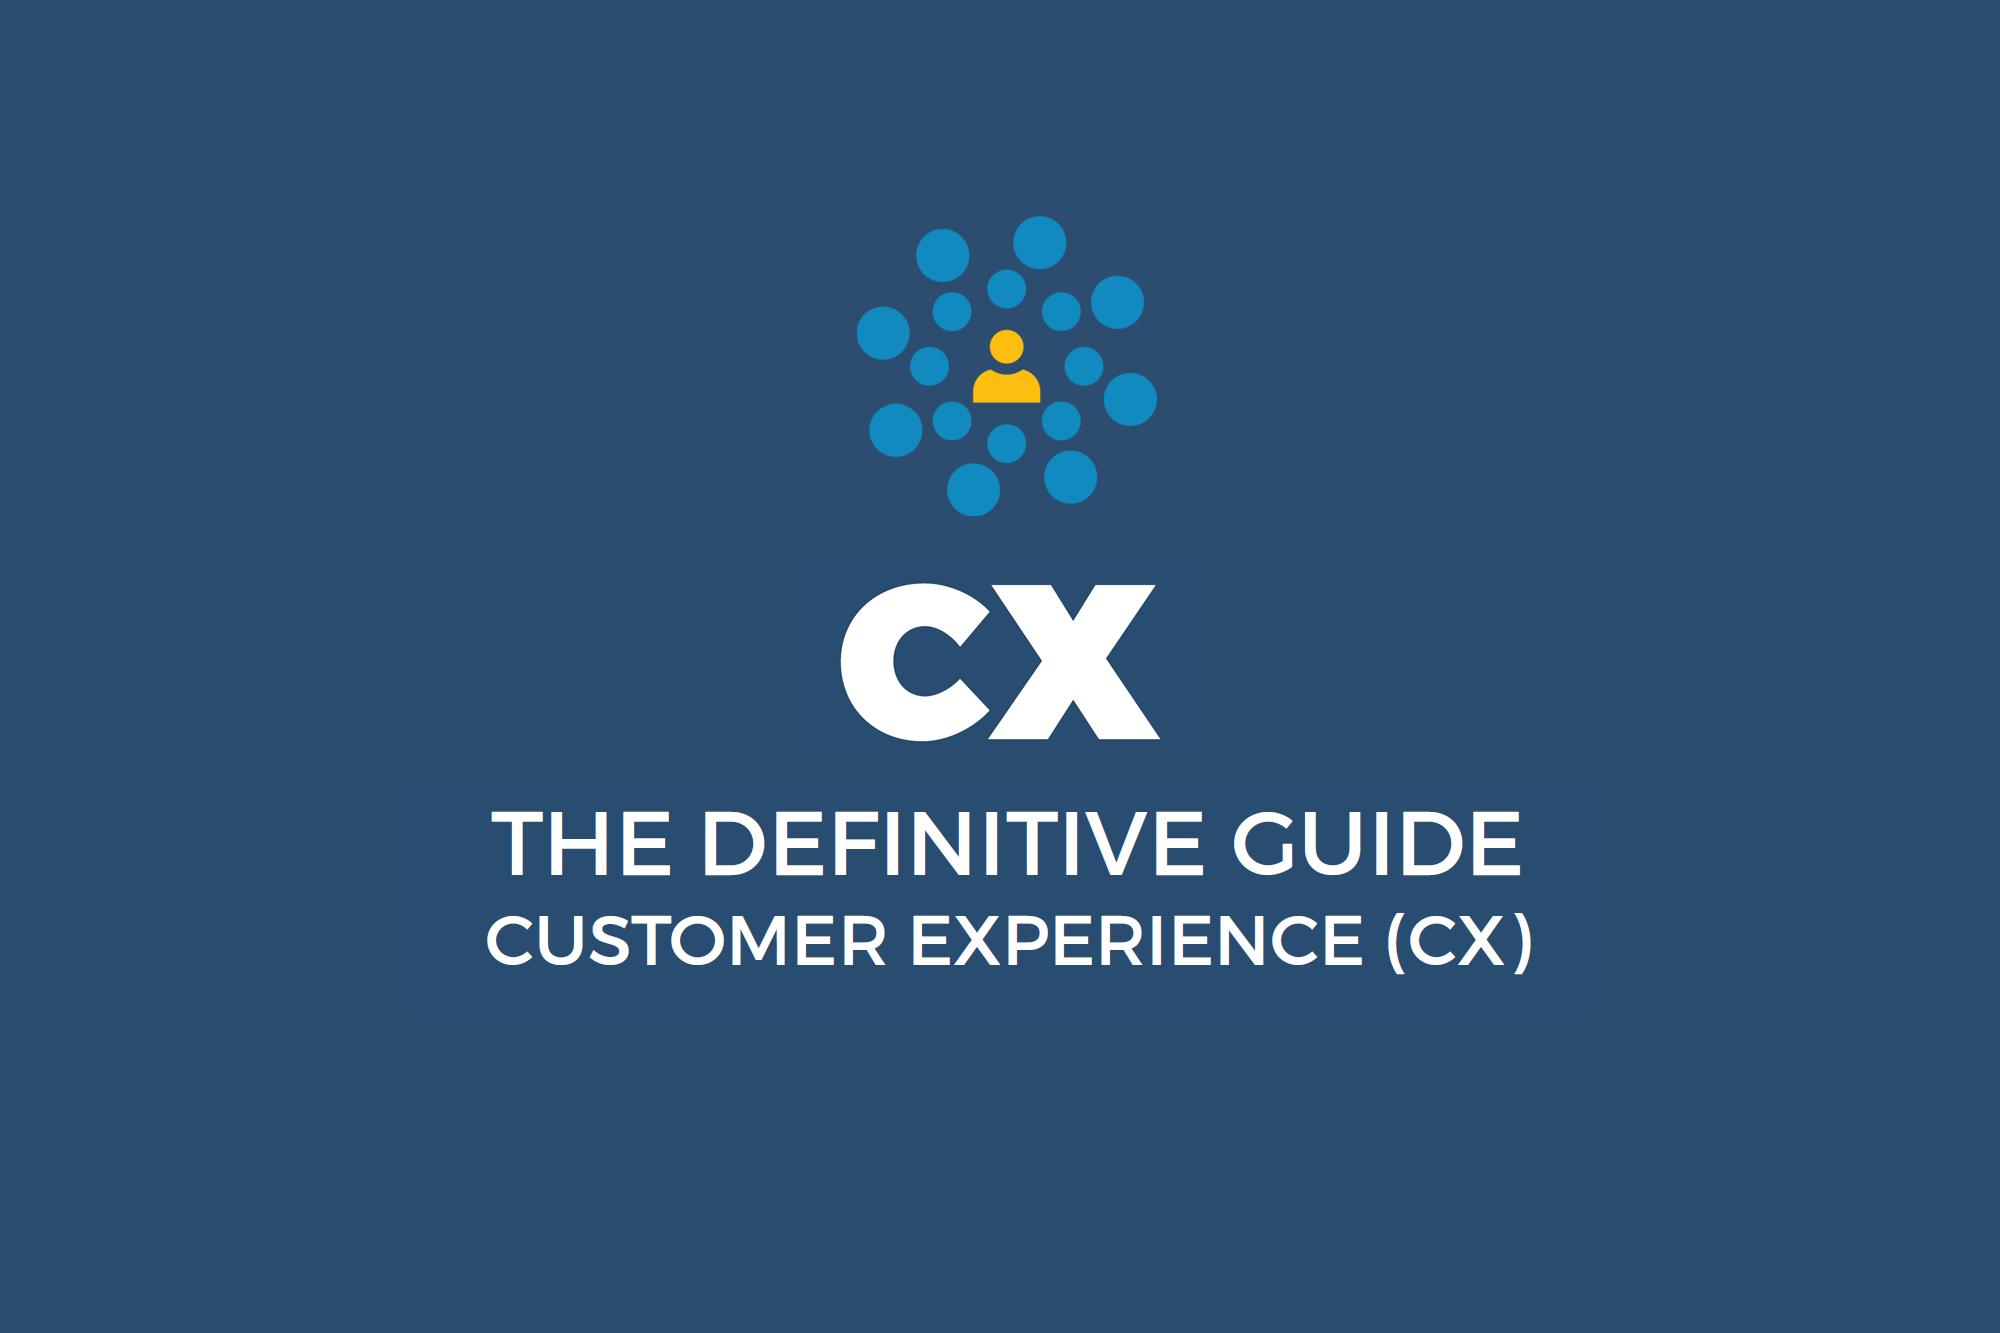 VOX Customer Experience